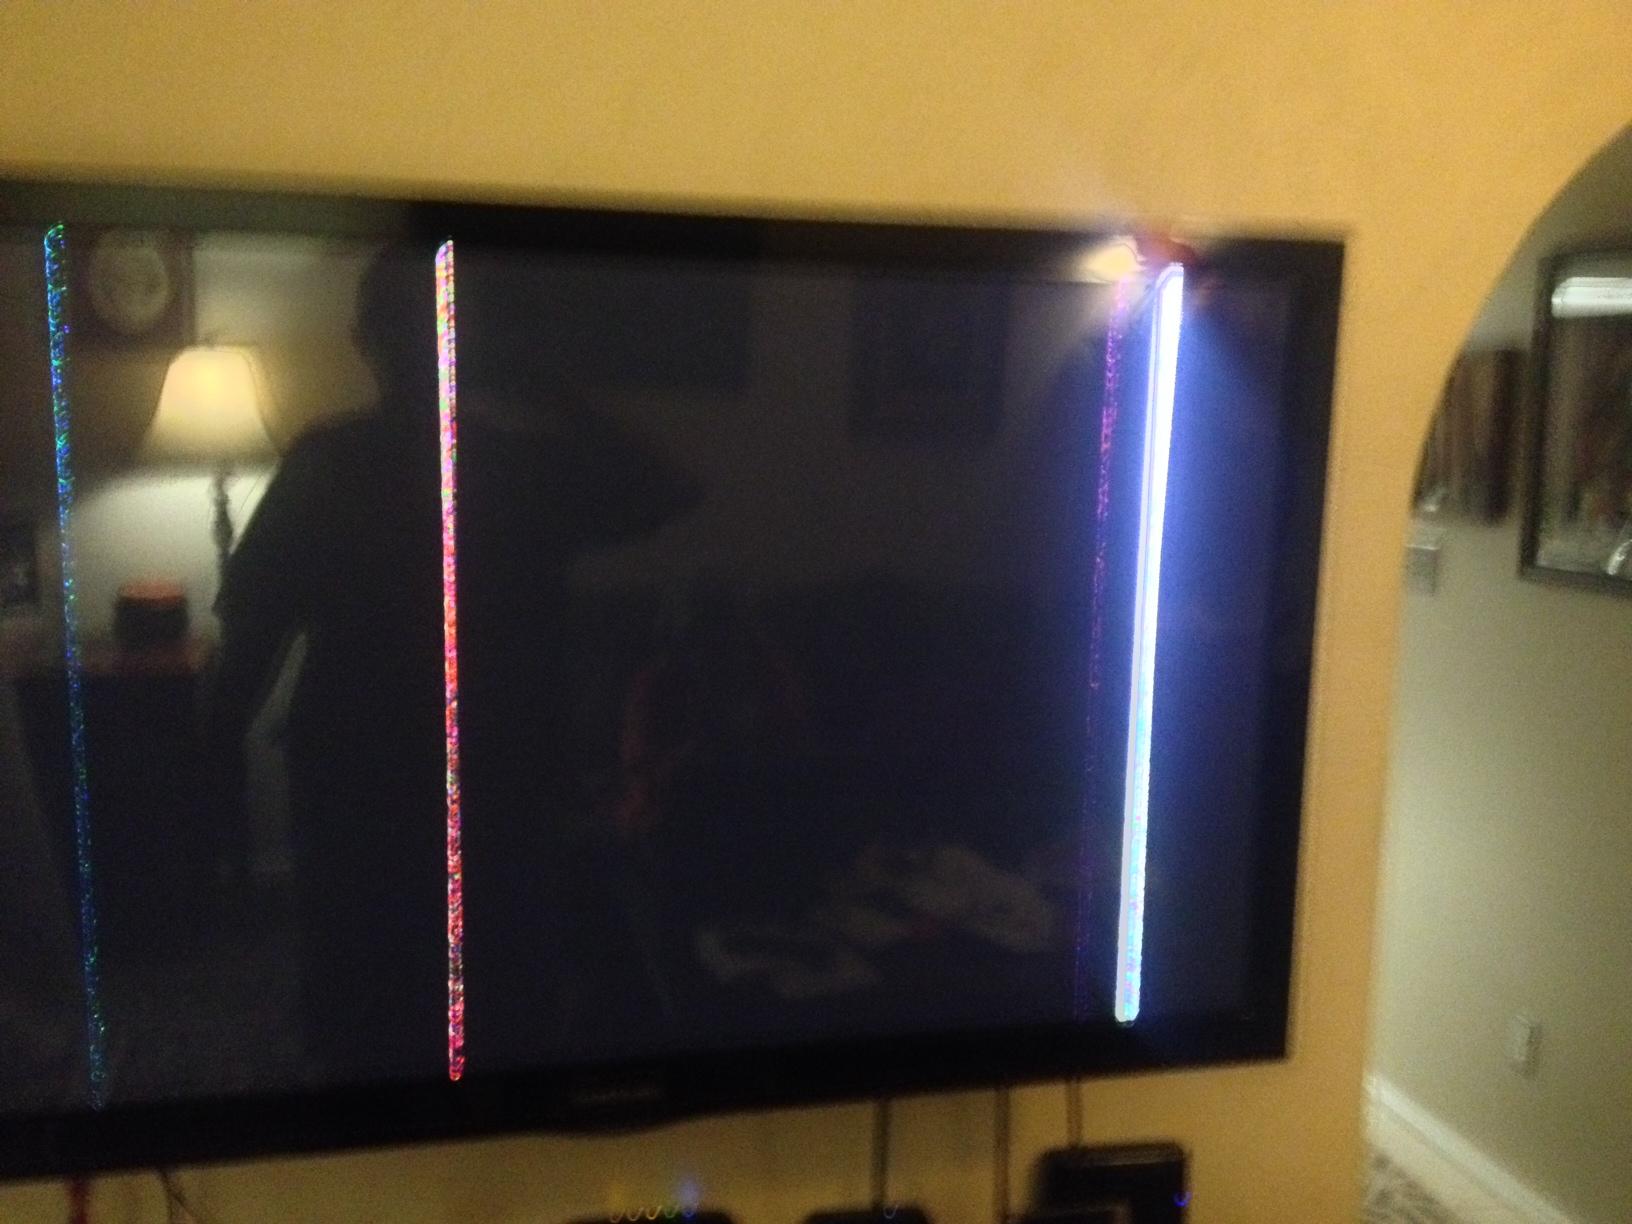 TV Tech1, I have a SAMSUNG PN50C450B1DXZA (NY02) plasma TV